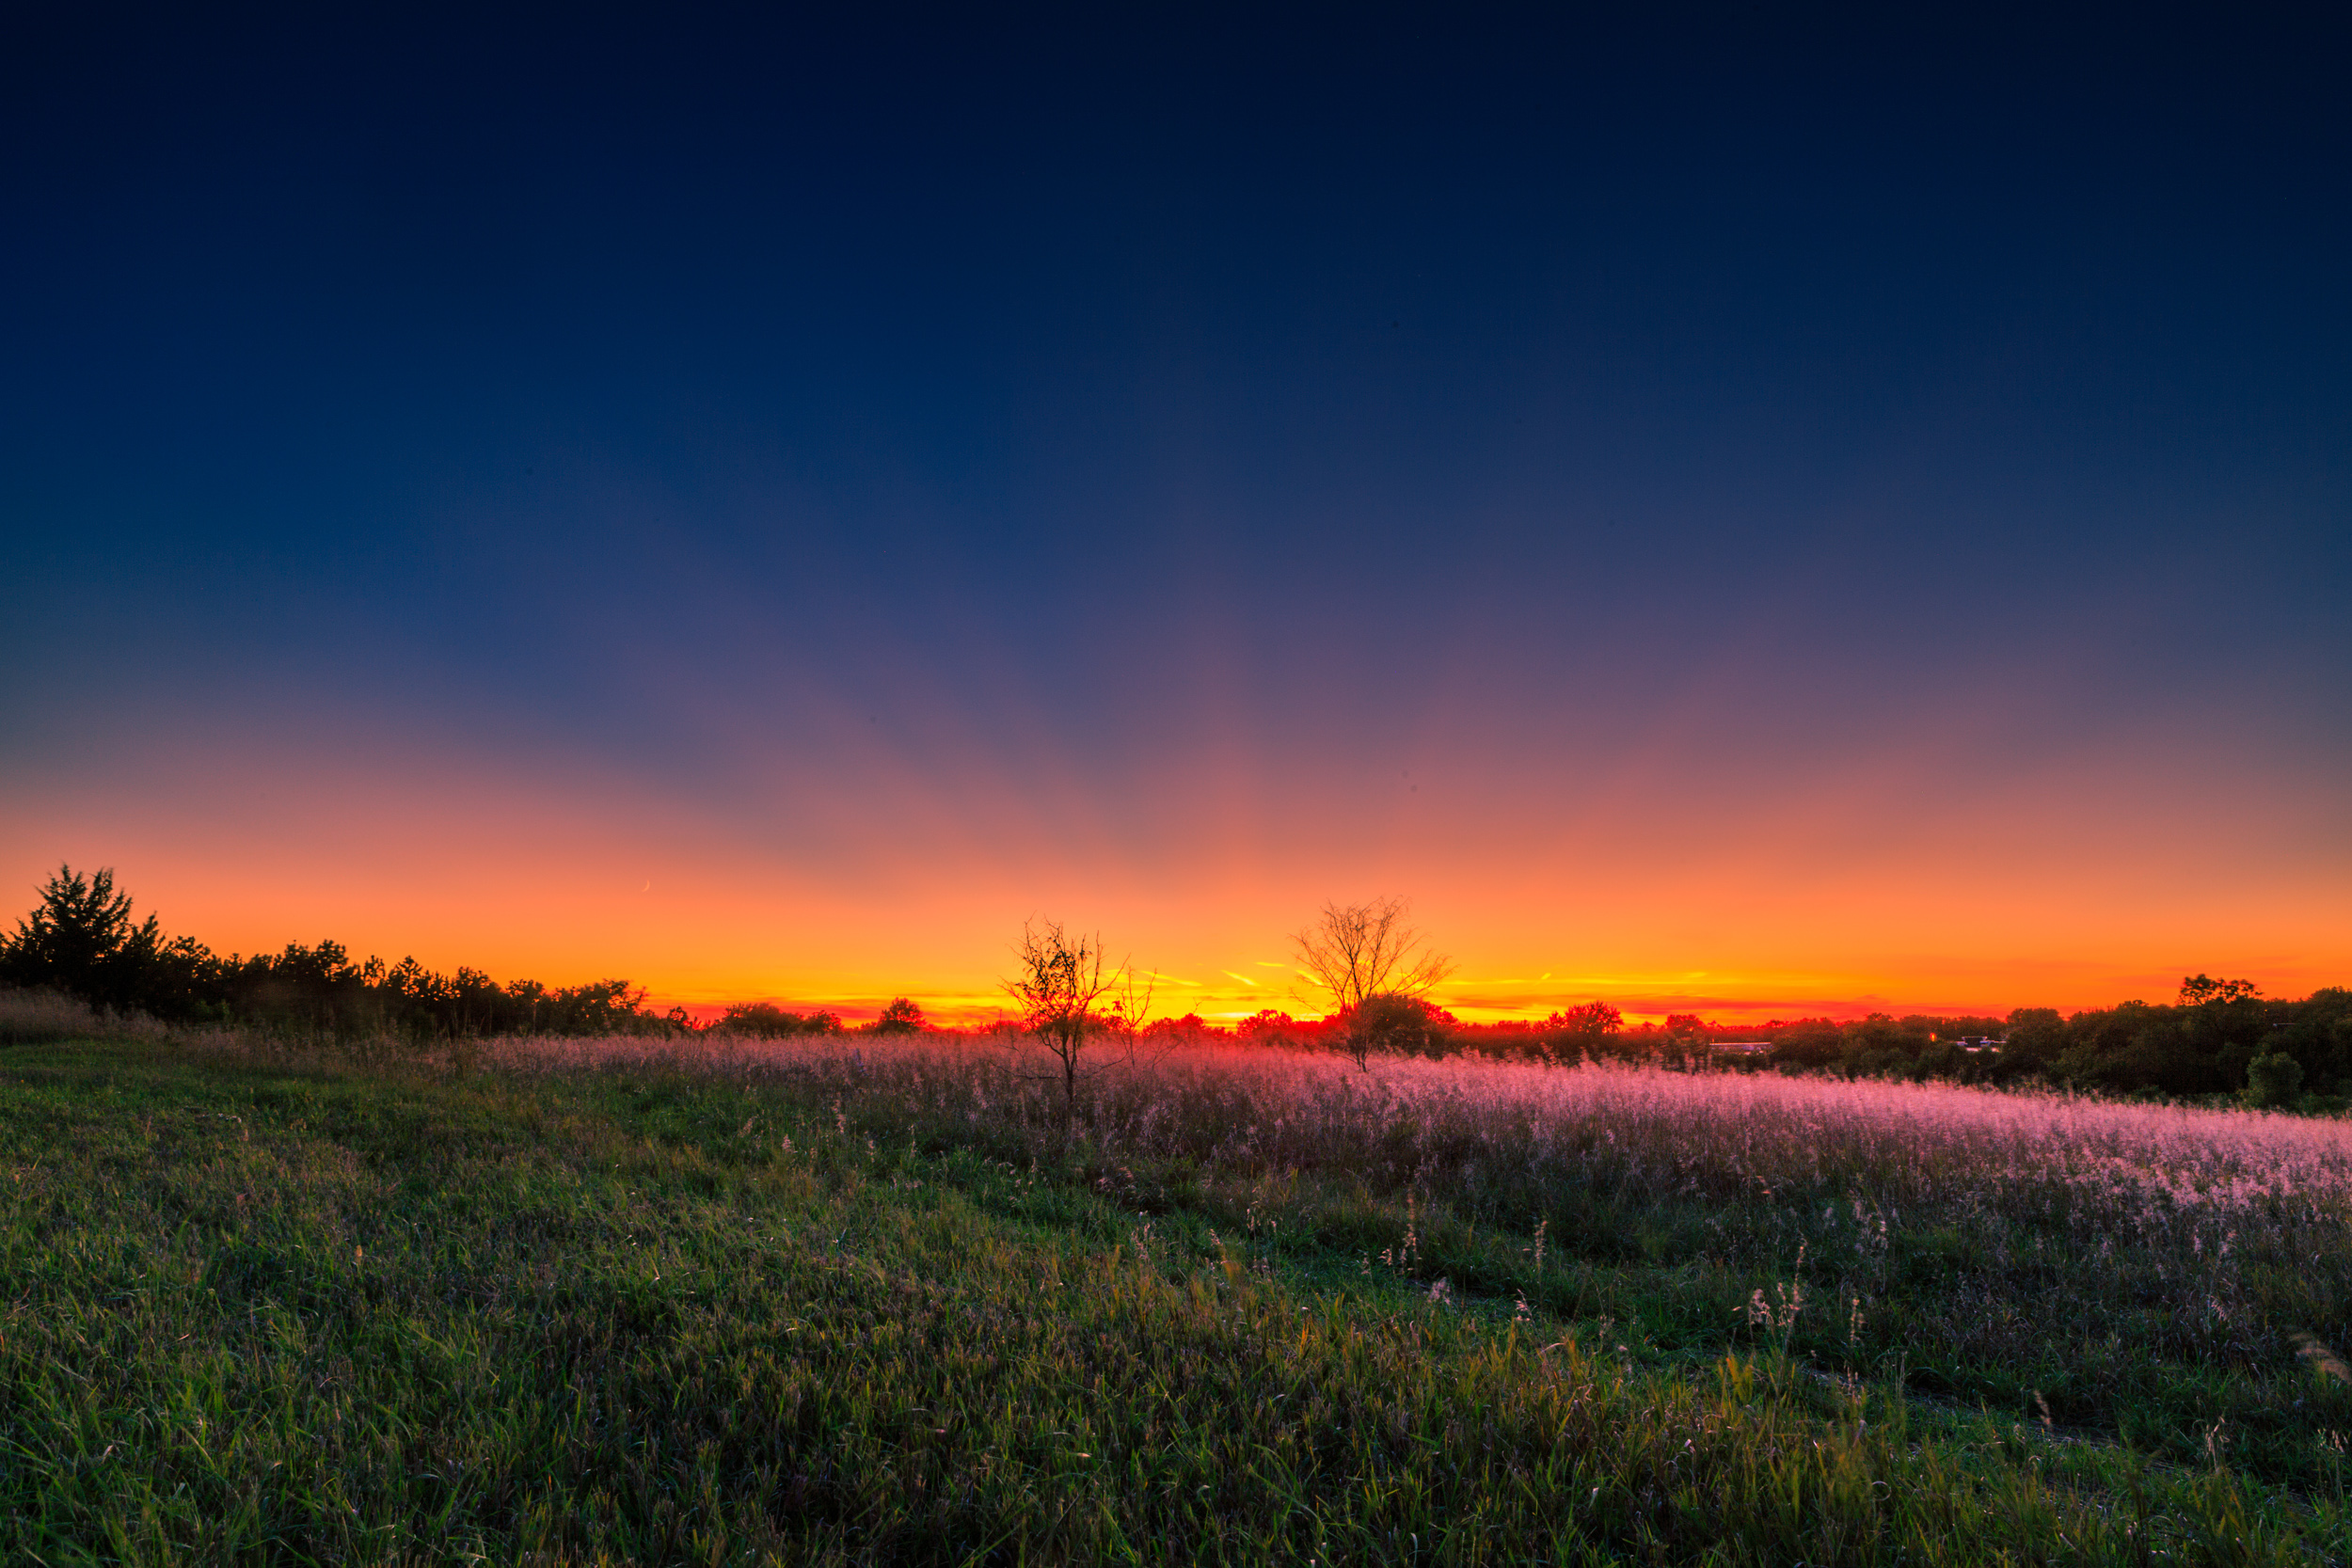 In the middle of nowhere, Lincoln, Nebraska